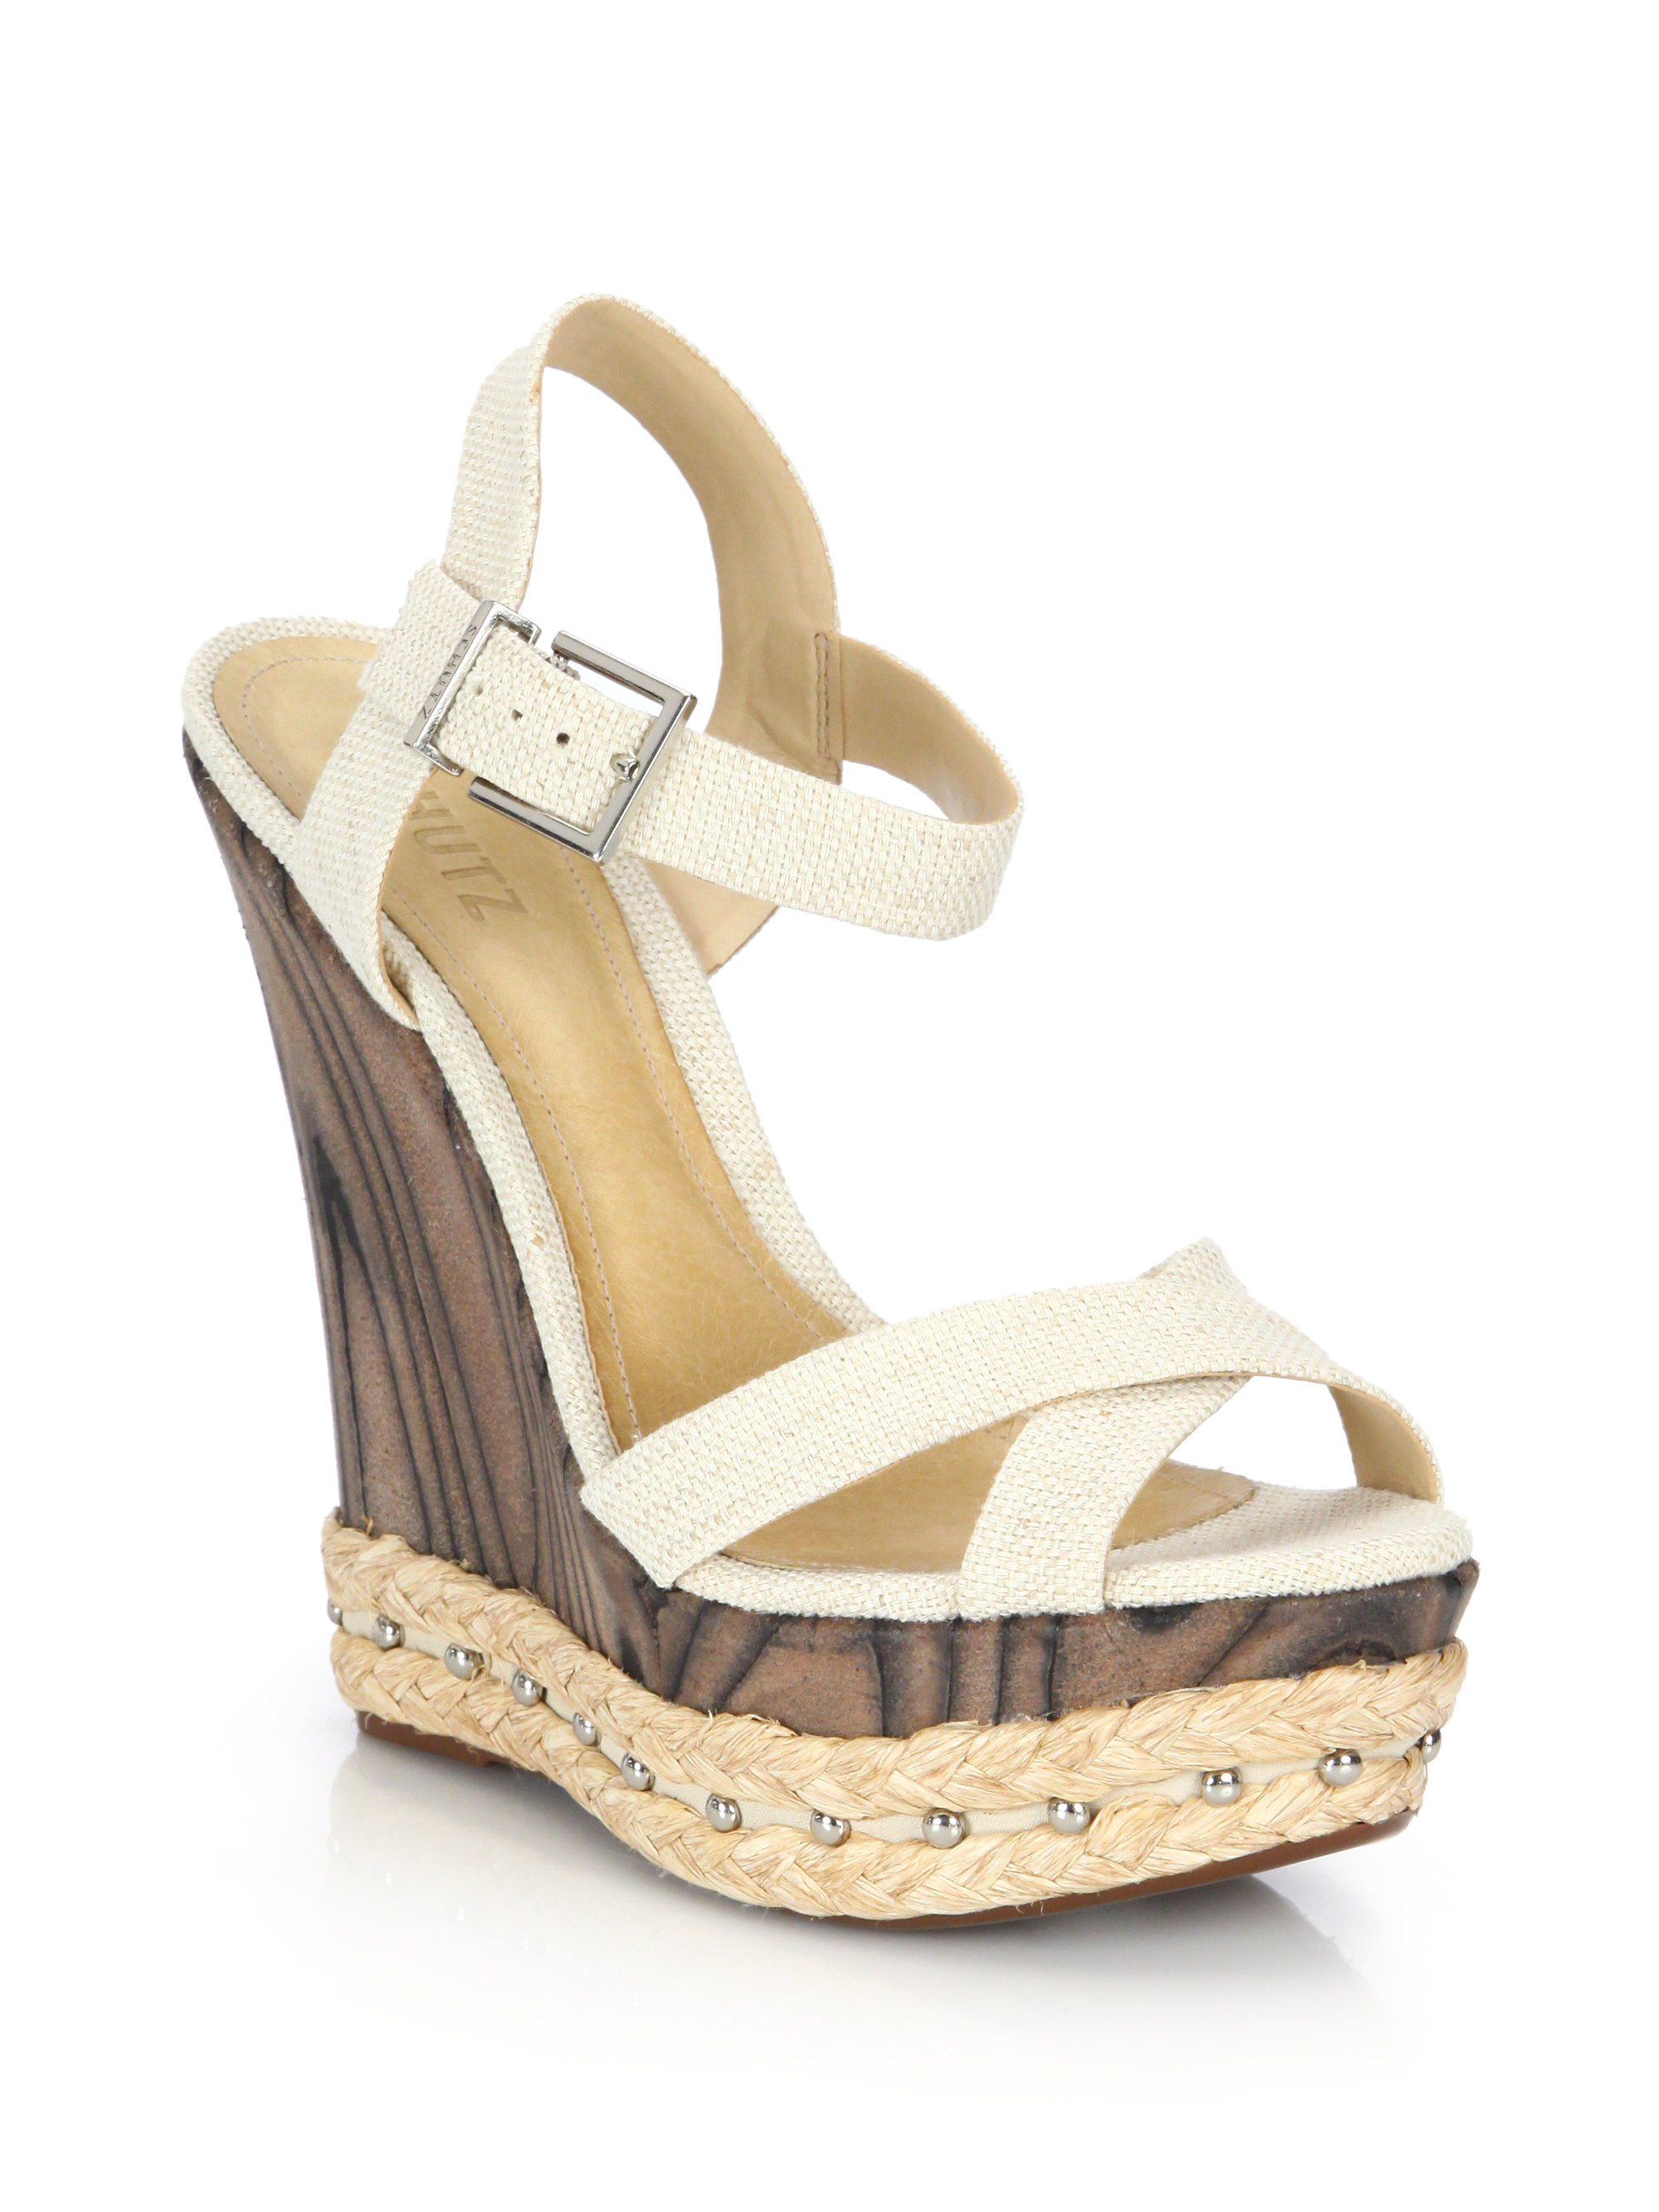 Schutz Fiore Mixed Media Platform Wedge Sandals In Gray Lyst